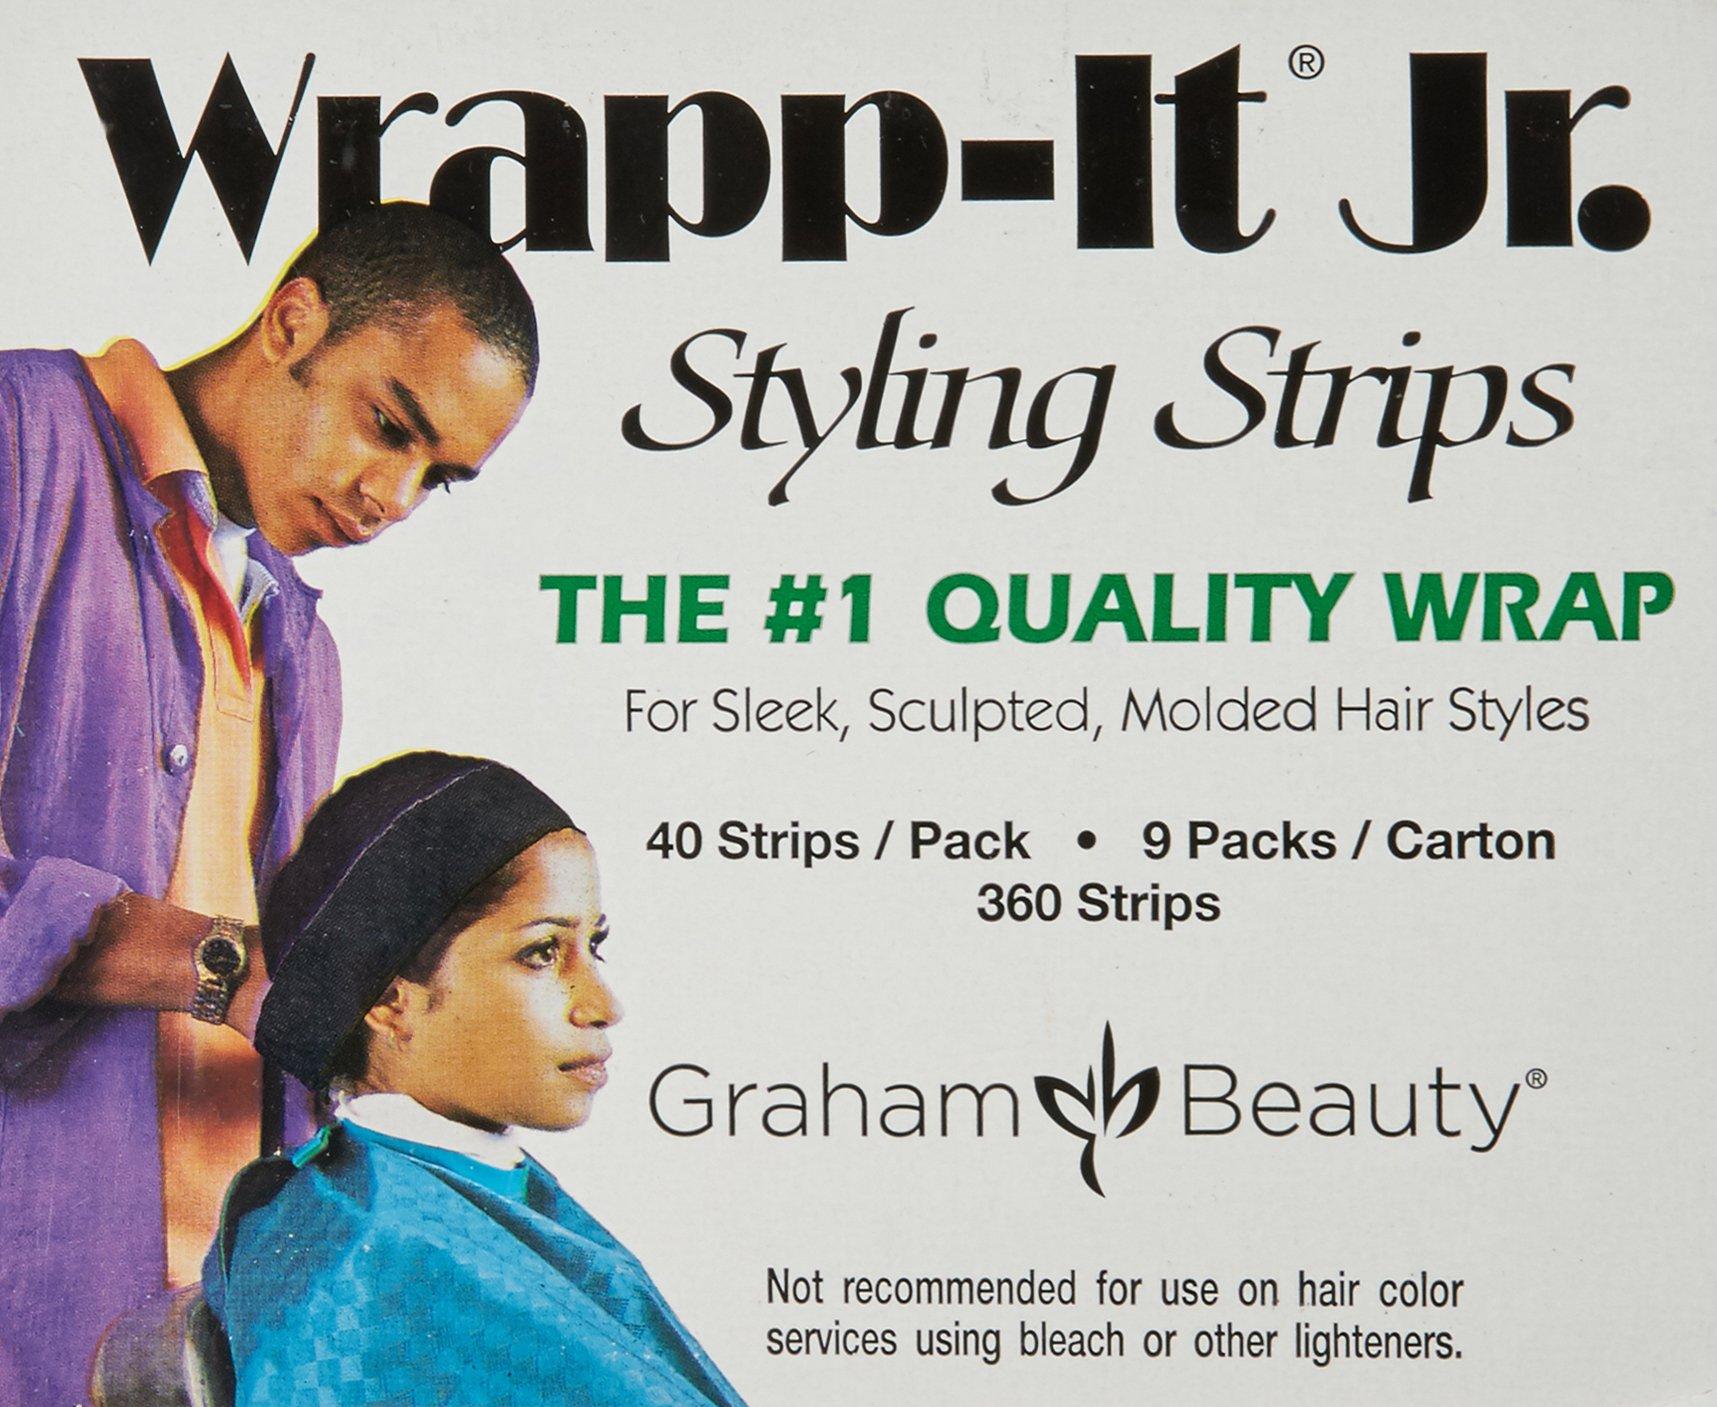 Graham Professional Beauty Wrapp-It Jr Styling Strips, Black by Graham Professional Beauty (Image #2)